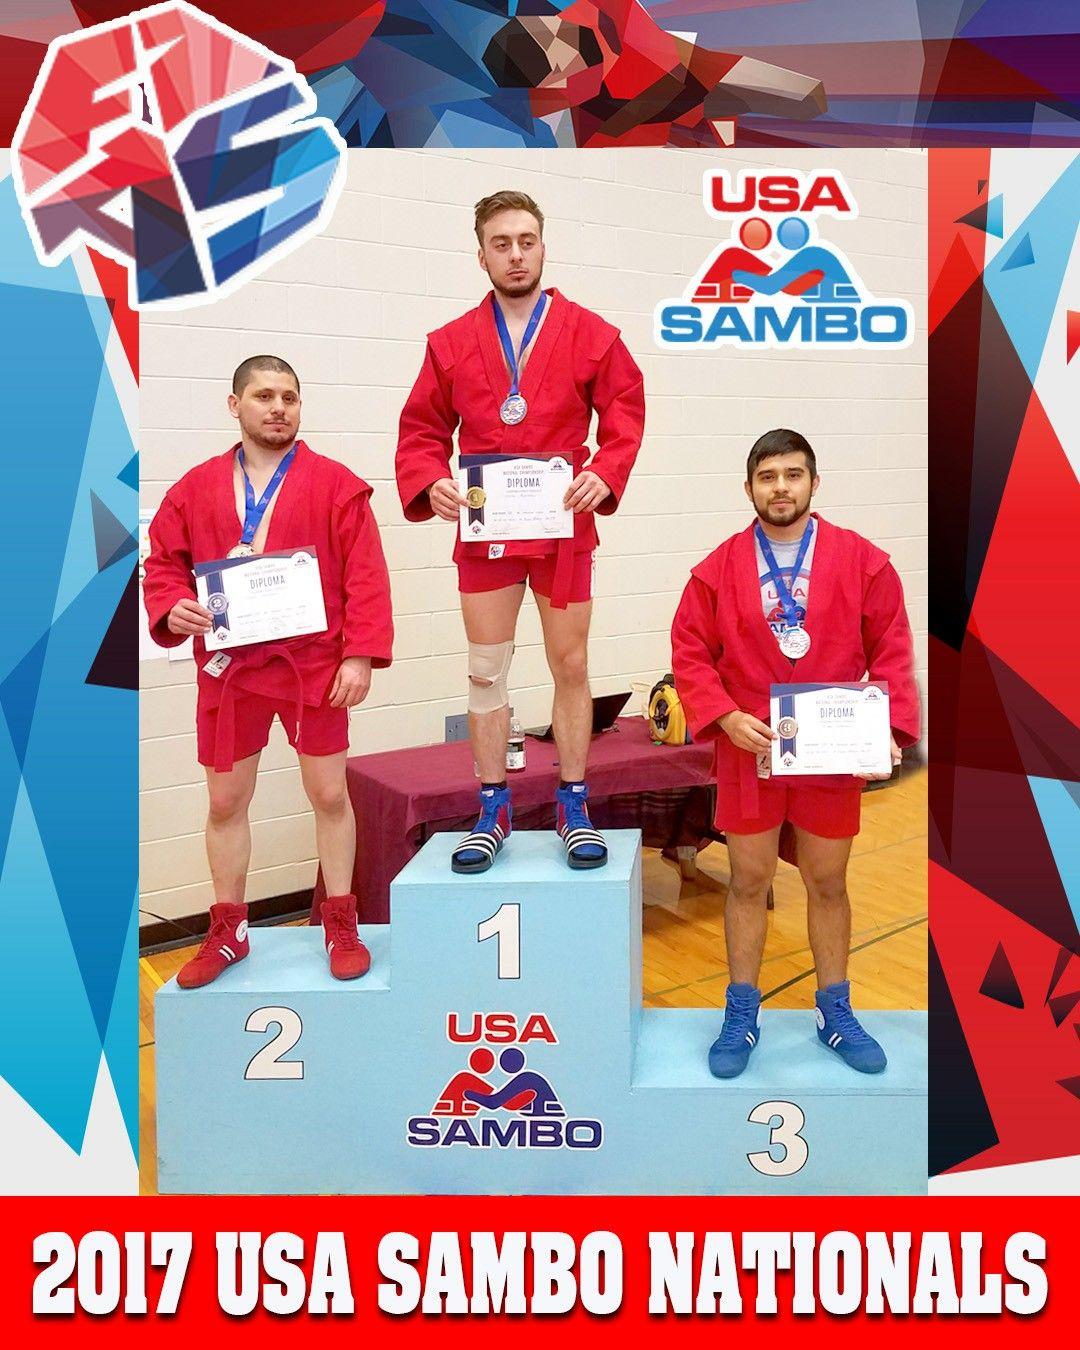 2017 USA SAMBO NATIONALS Julian Sanchez mens 68kg Bronze